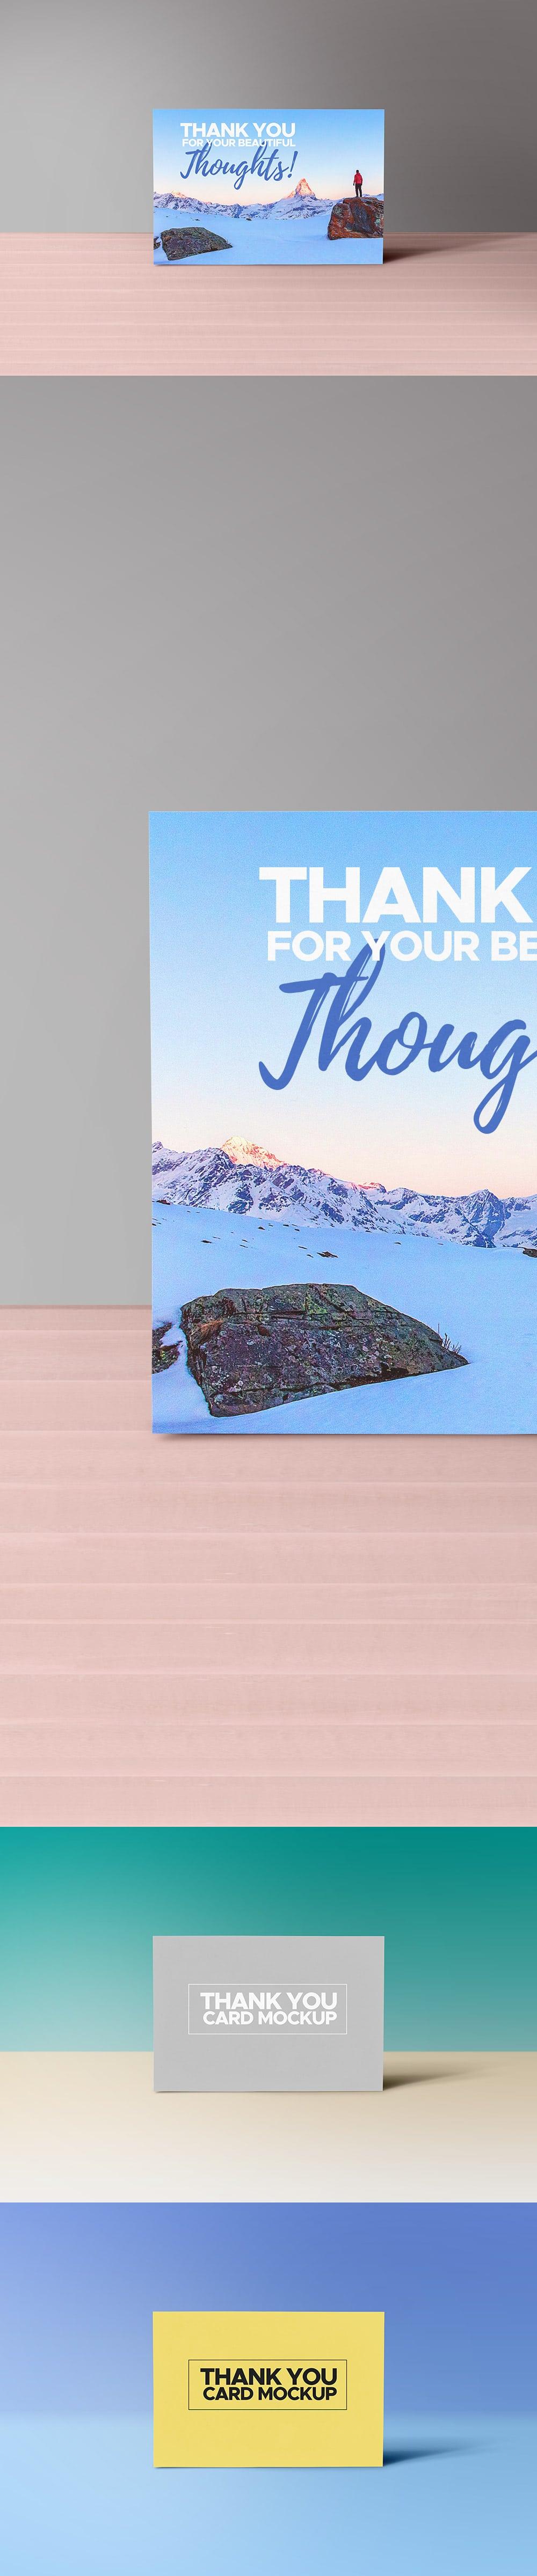 Free Heartwarming Thank You Card Mockup in PSD